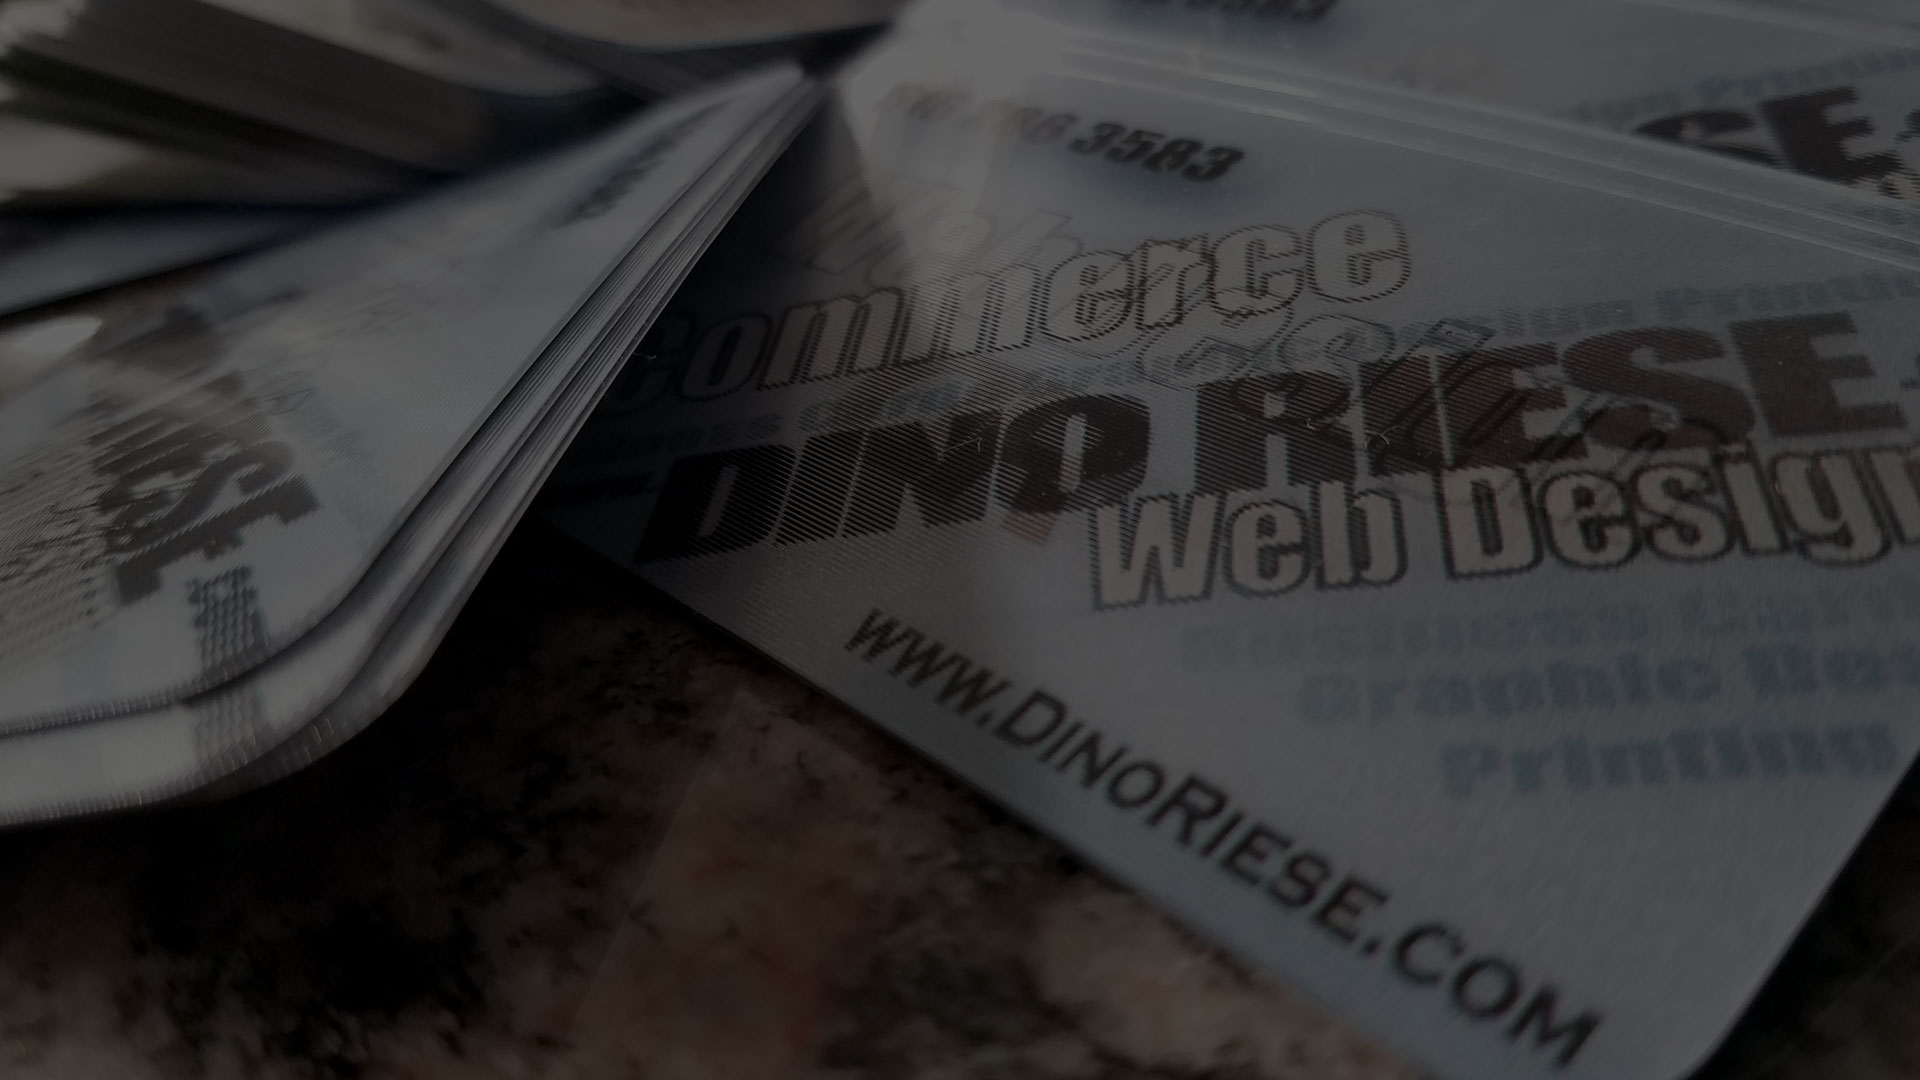 Business Card & Printing Service, NYC, DinoRiese.com